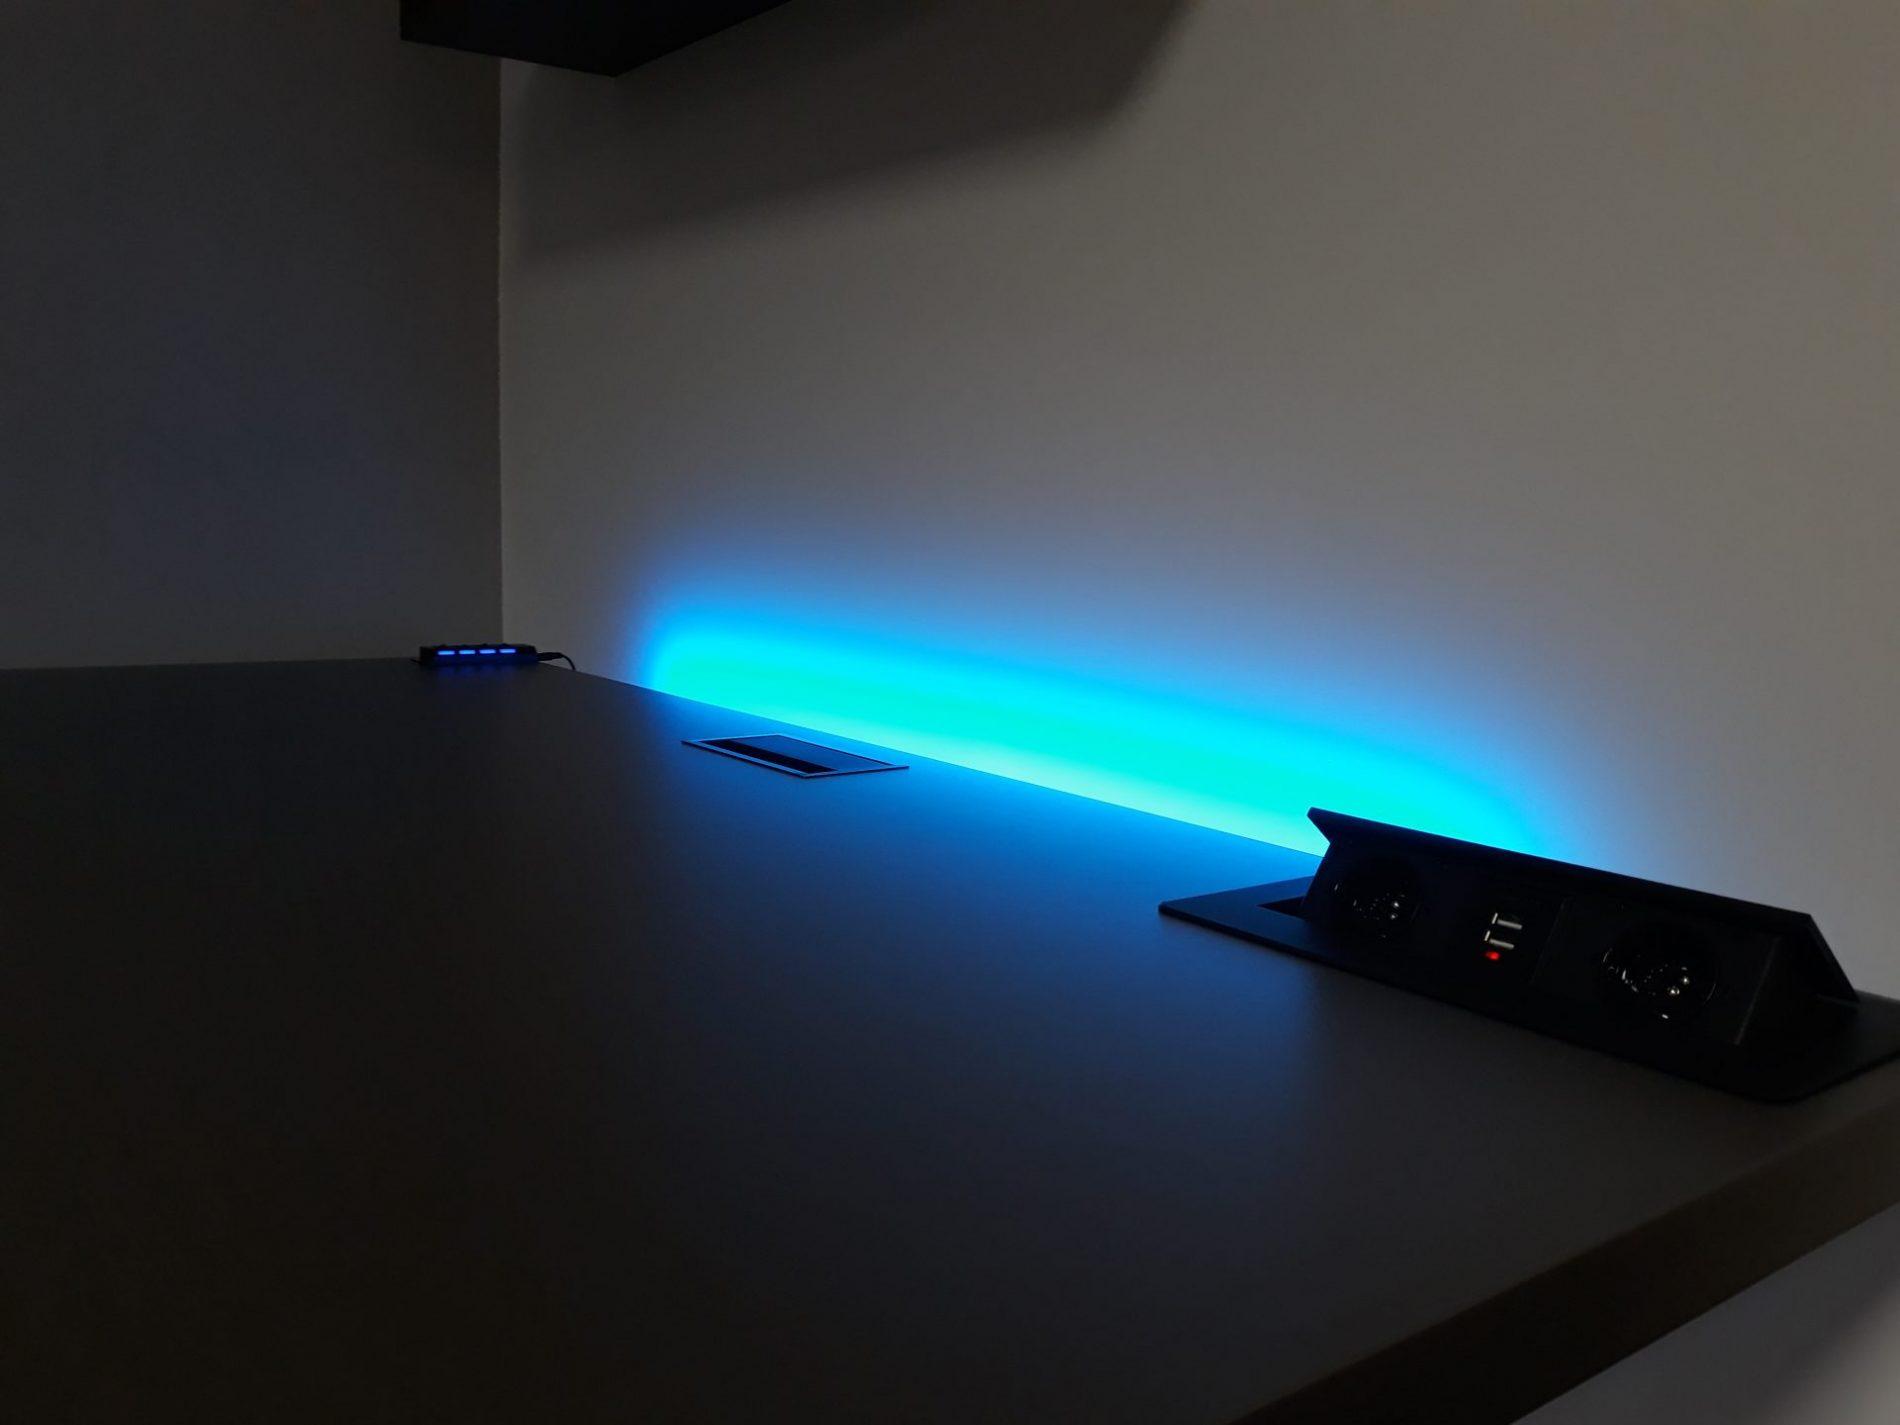 biurko led podświetlane komputerowe krl